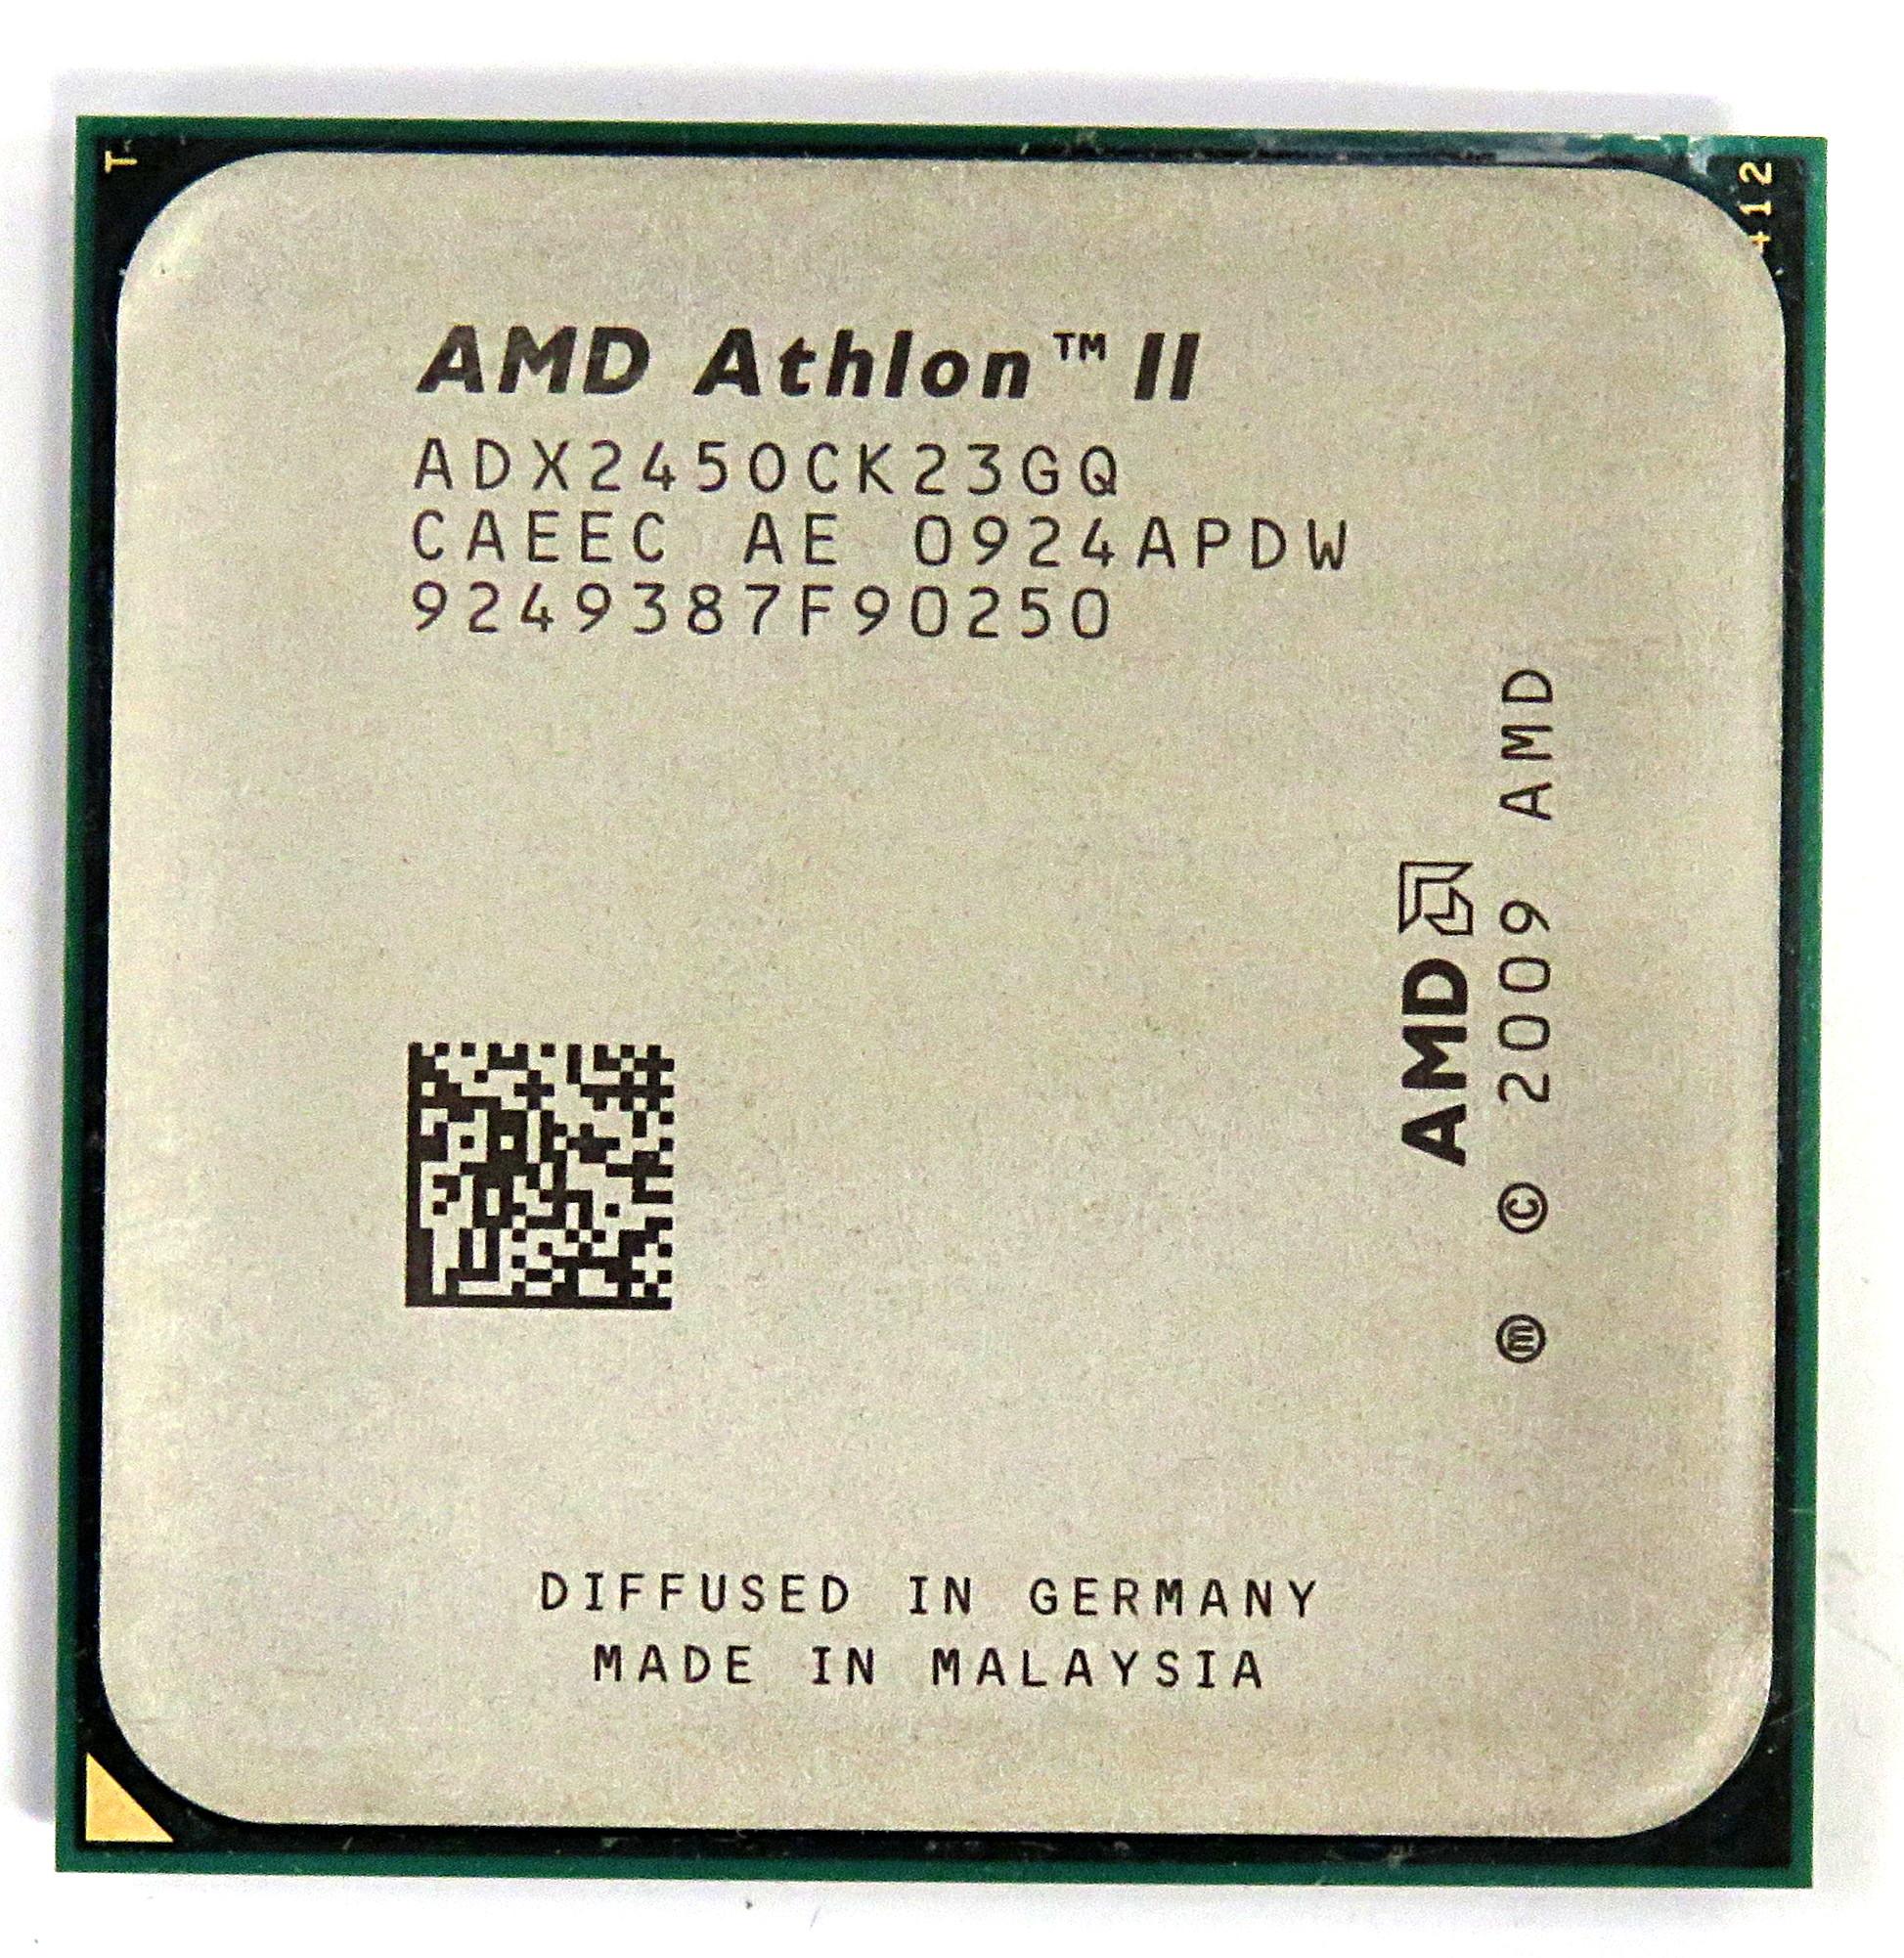 AMD Athlon II ADX245OCK23GQ 2.9GHz CPU Socket AM2+/AM3